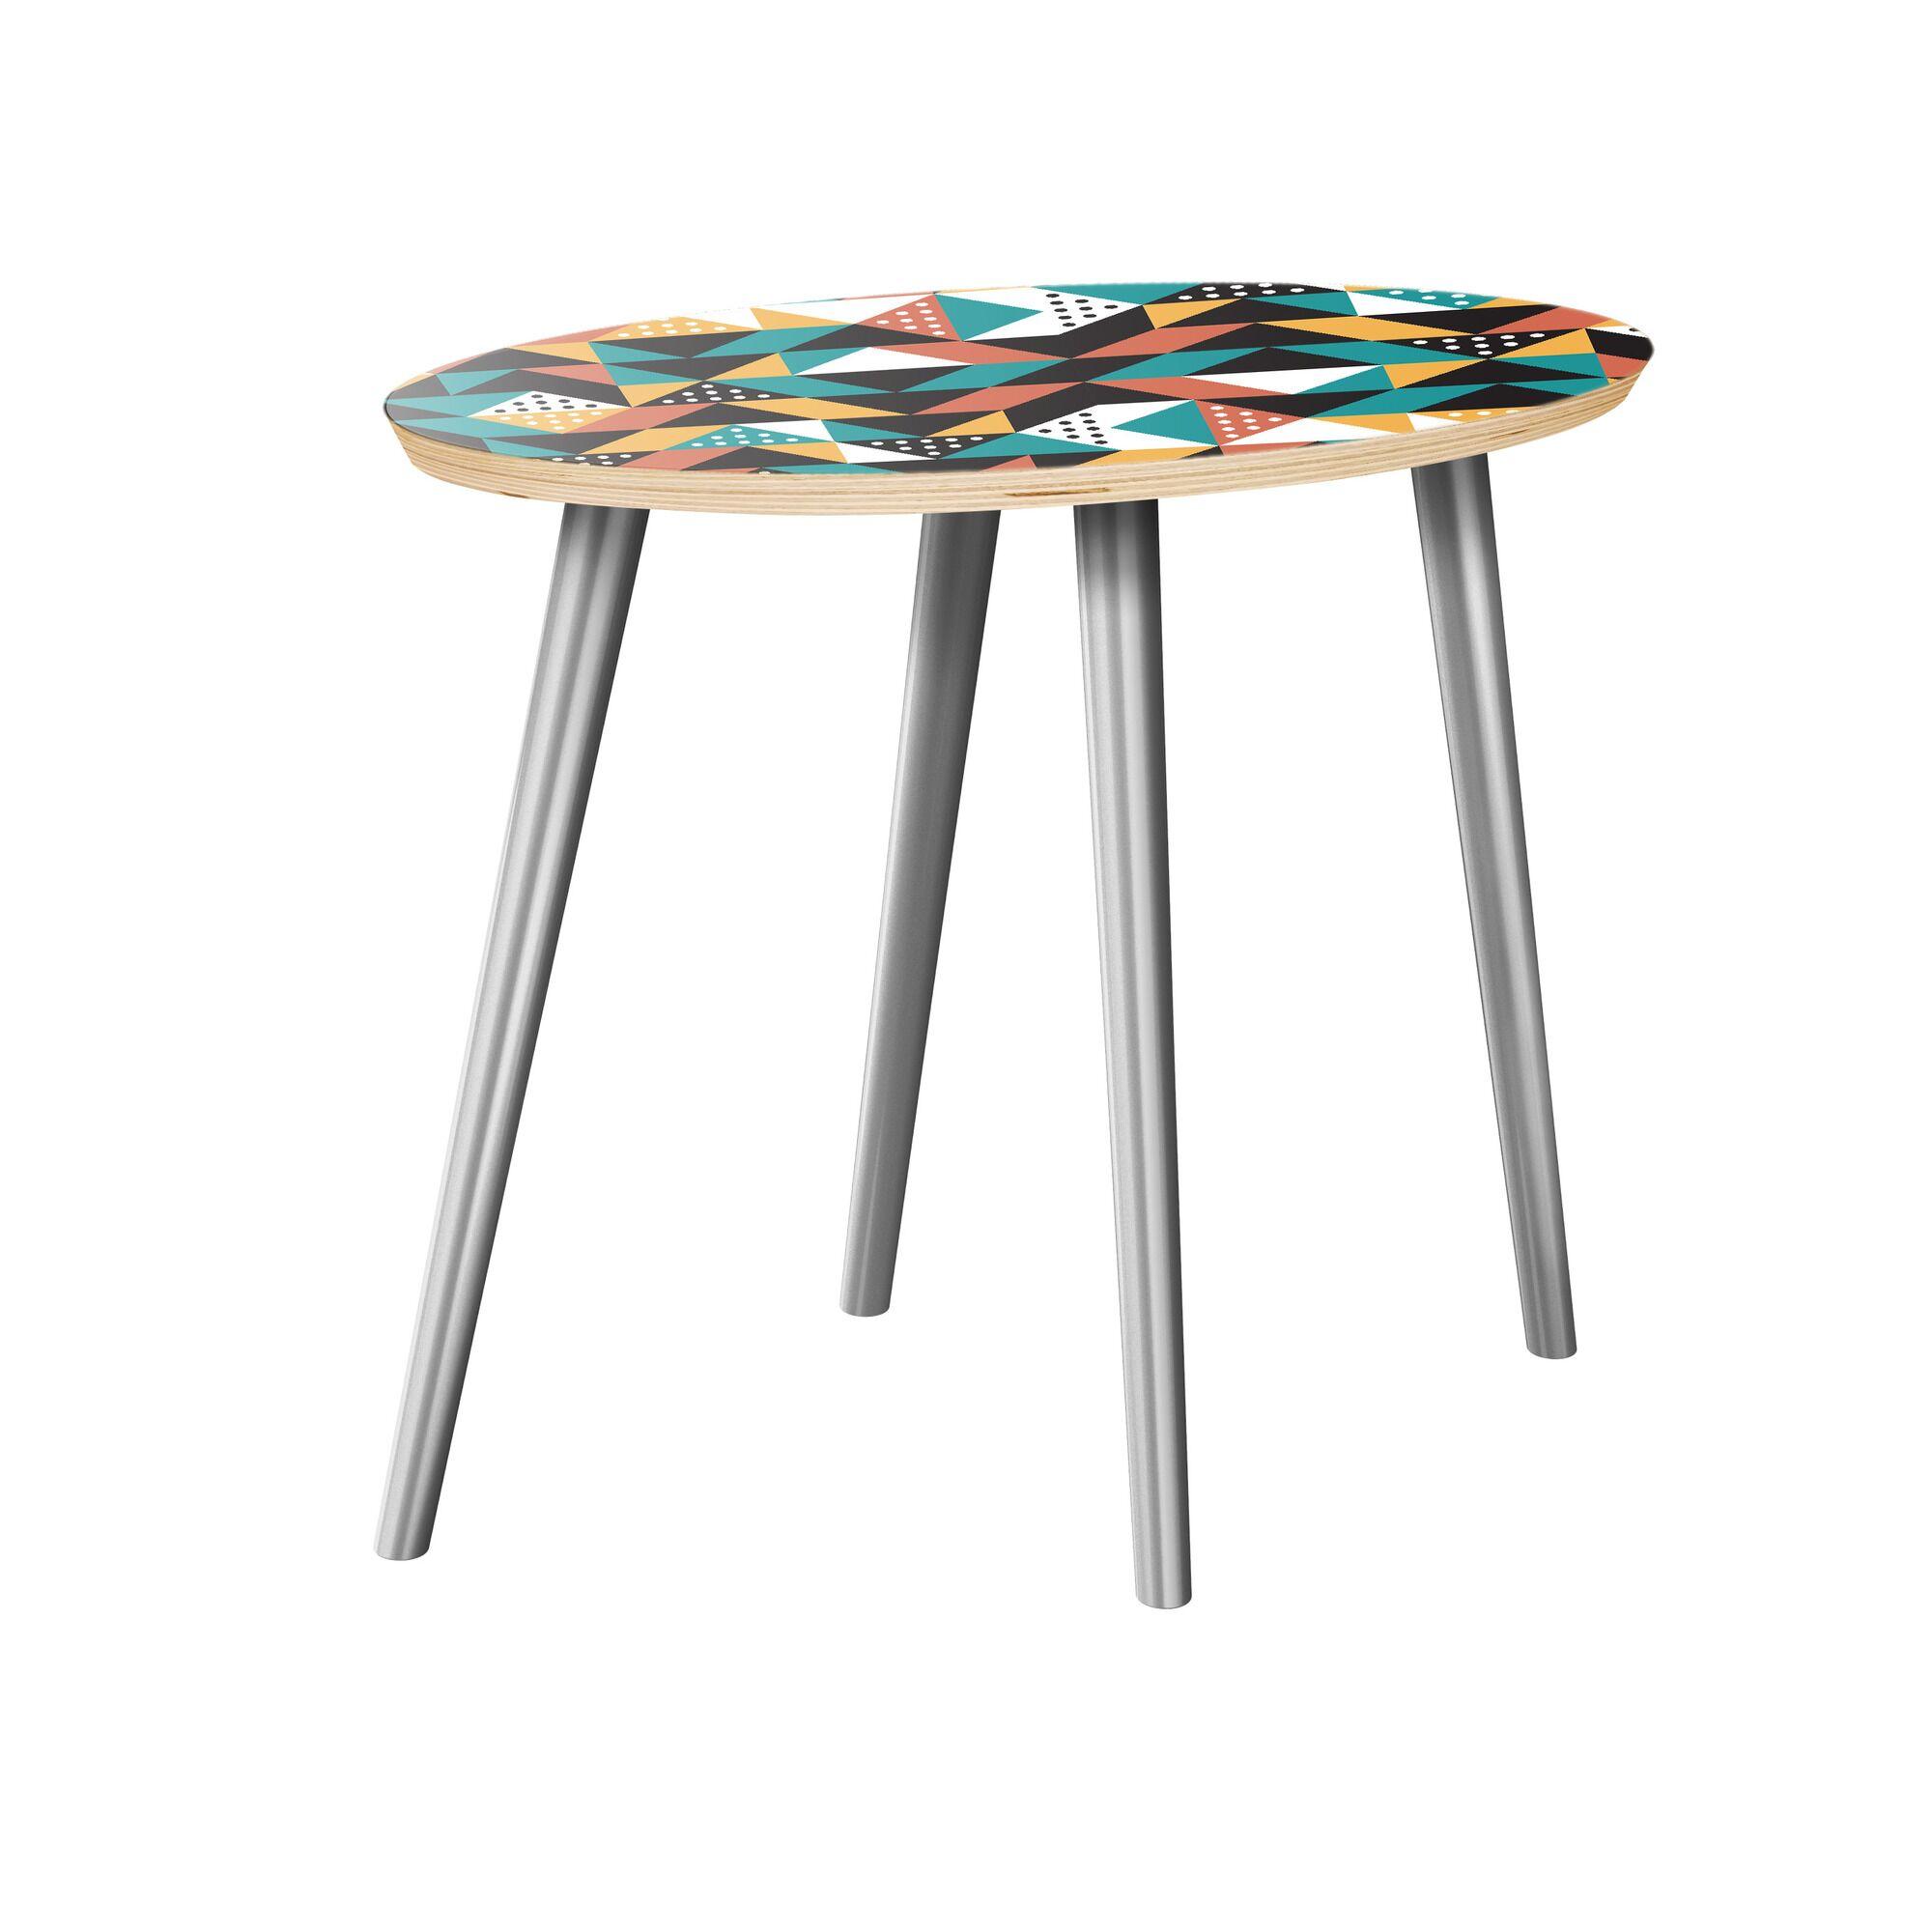 Arcelia End Table Table Top Color: Natural, Table Base Color: Chrome